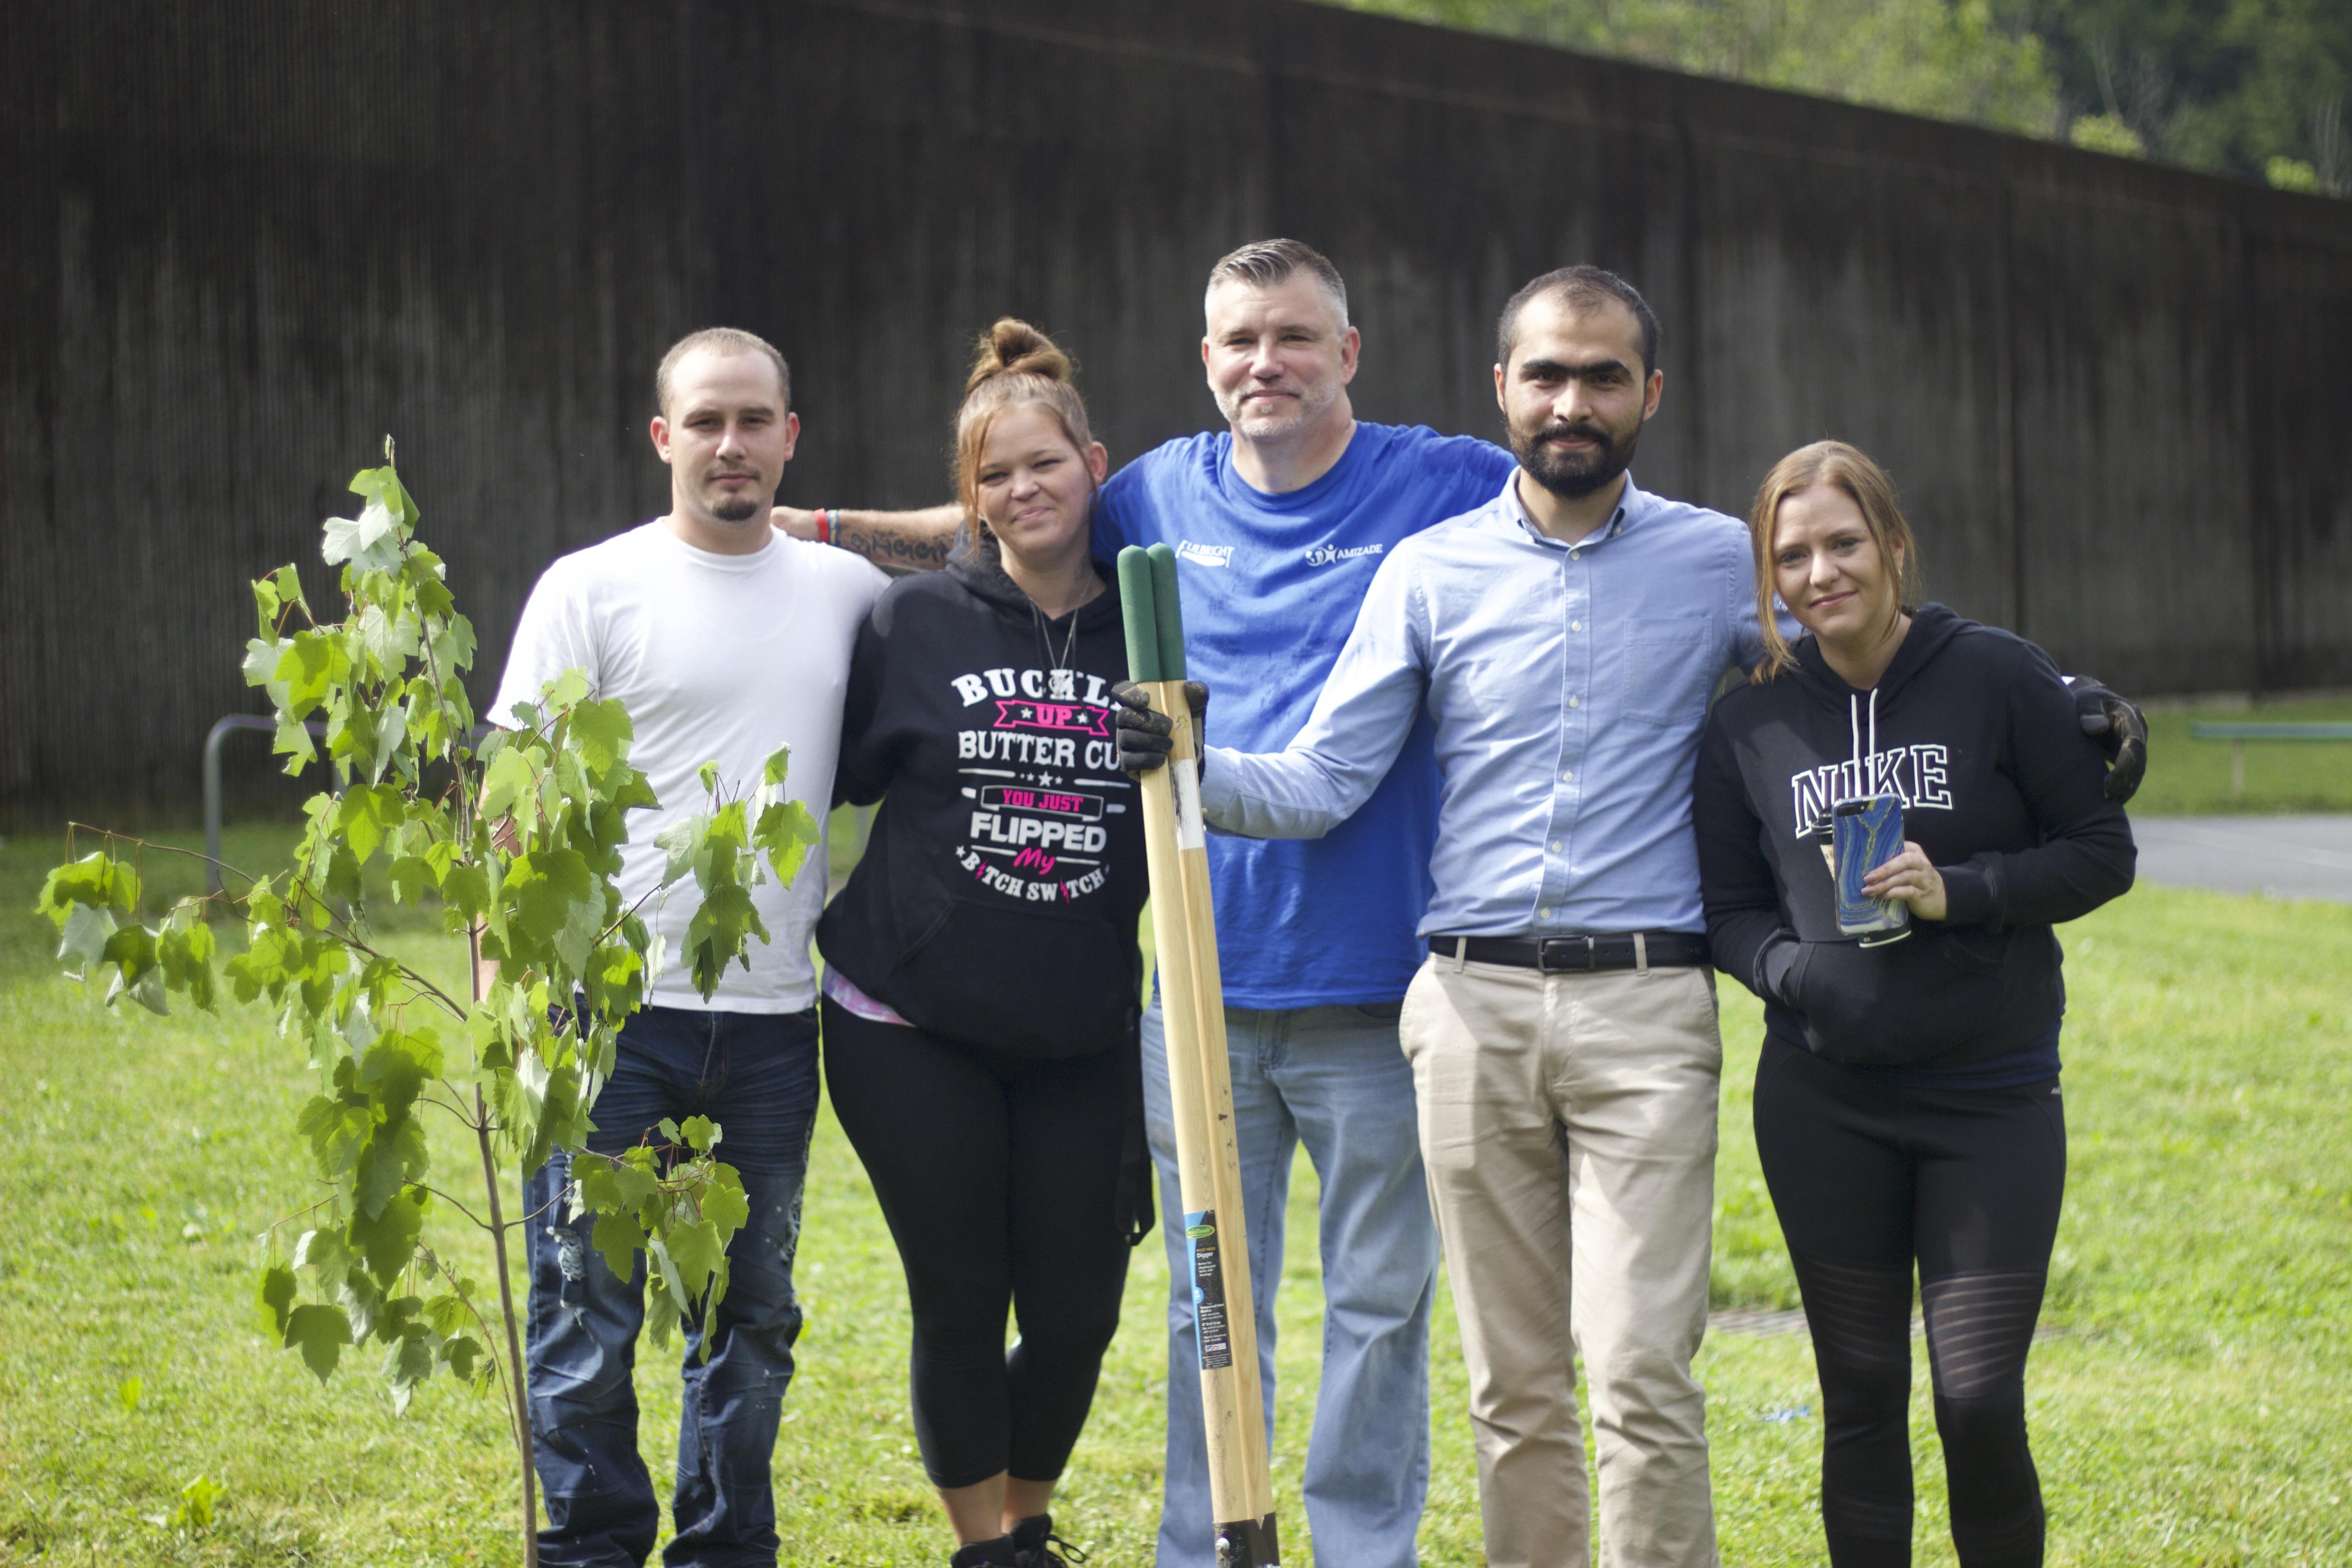 A Tree Grows in Williamson: Seeking Sustainability in Appalachia